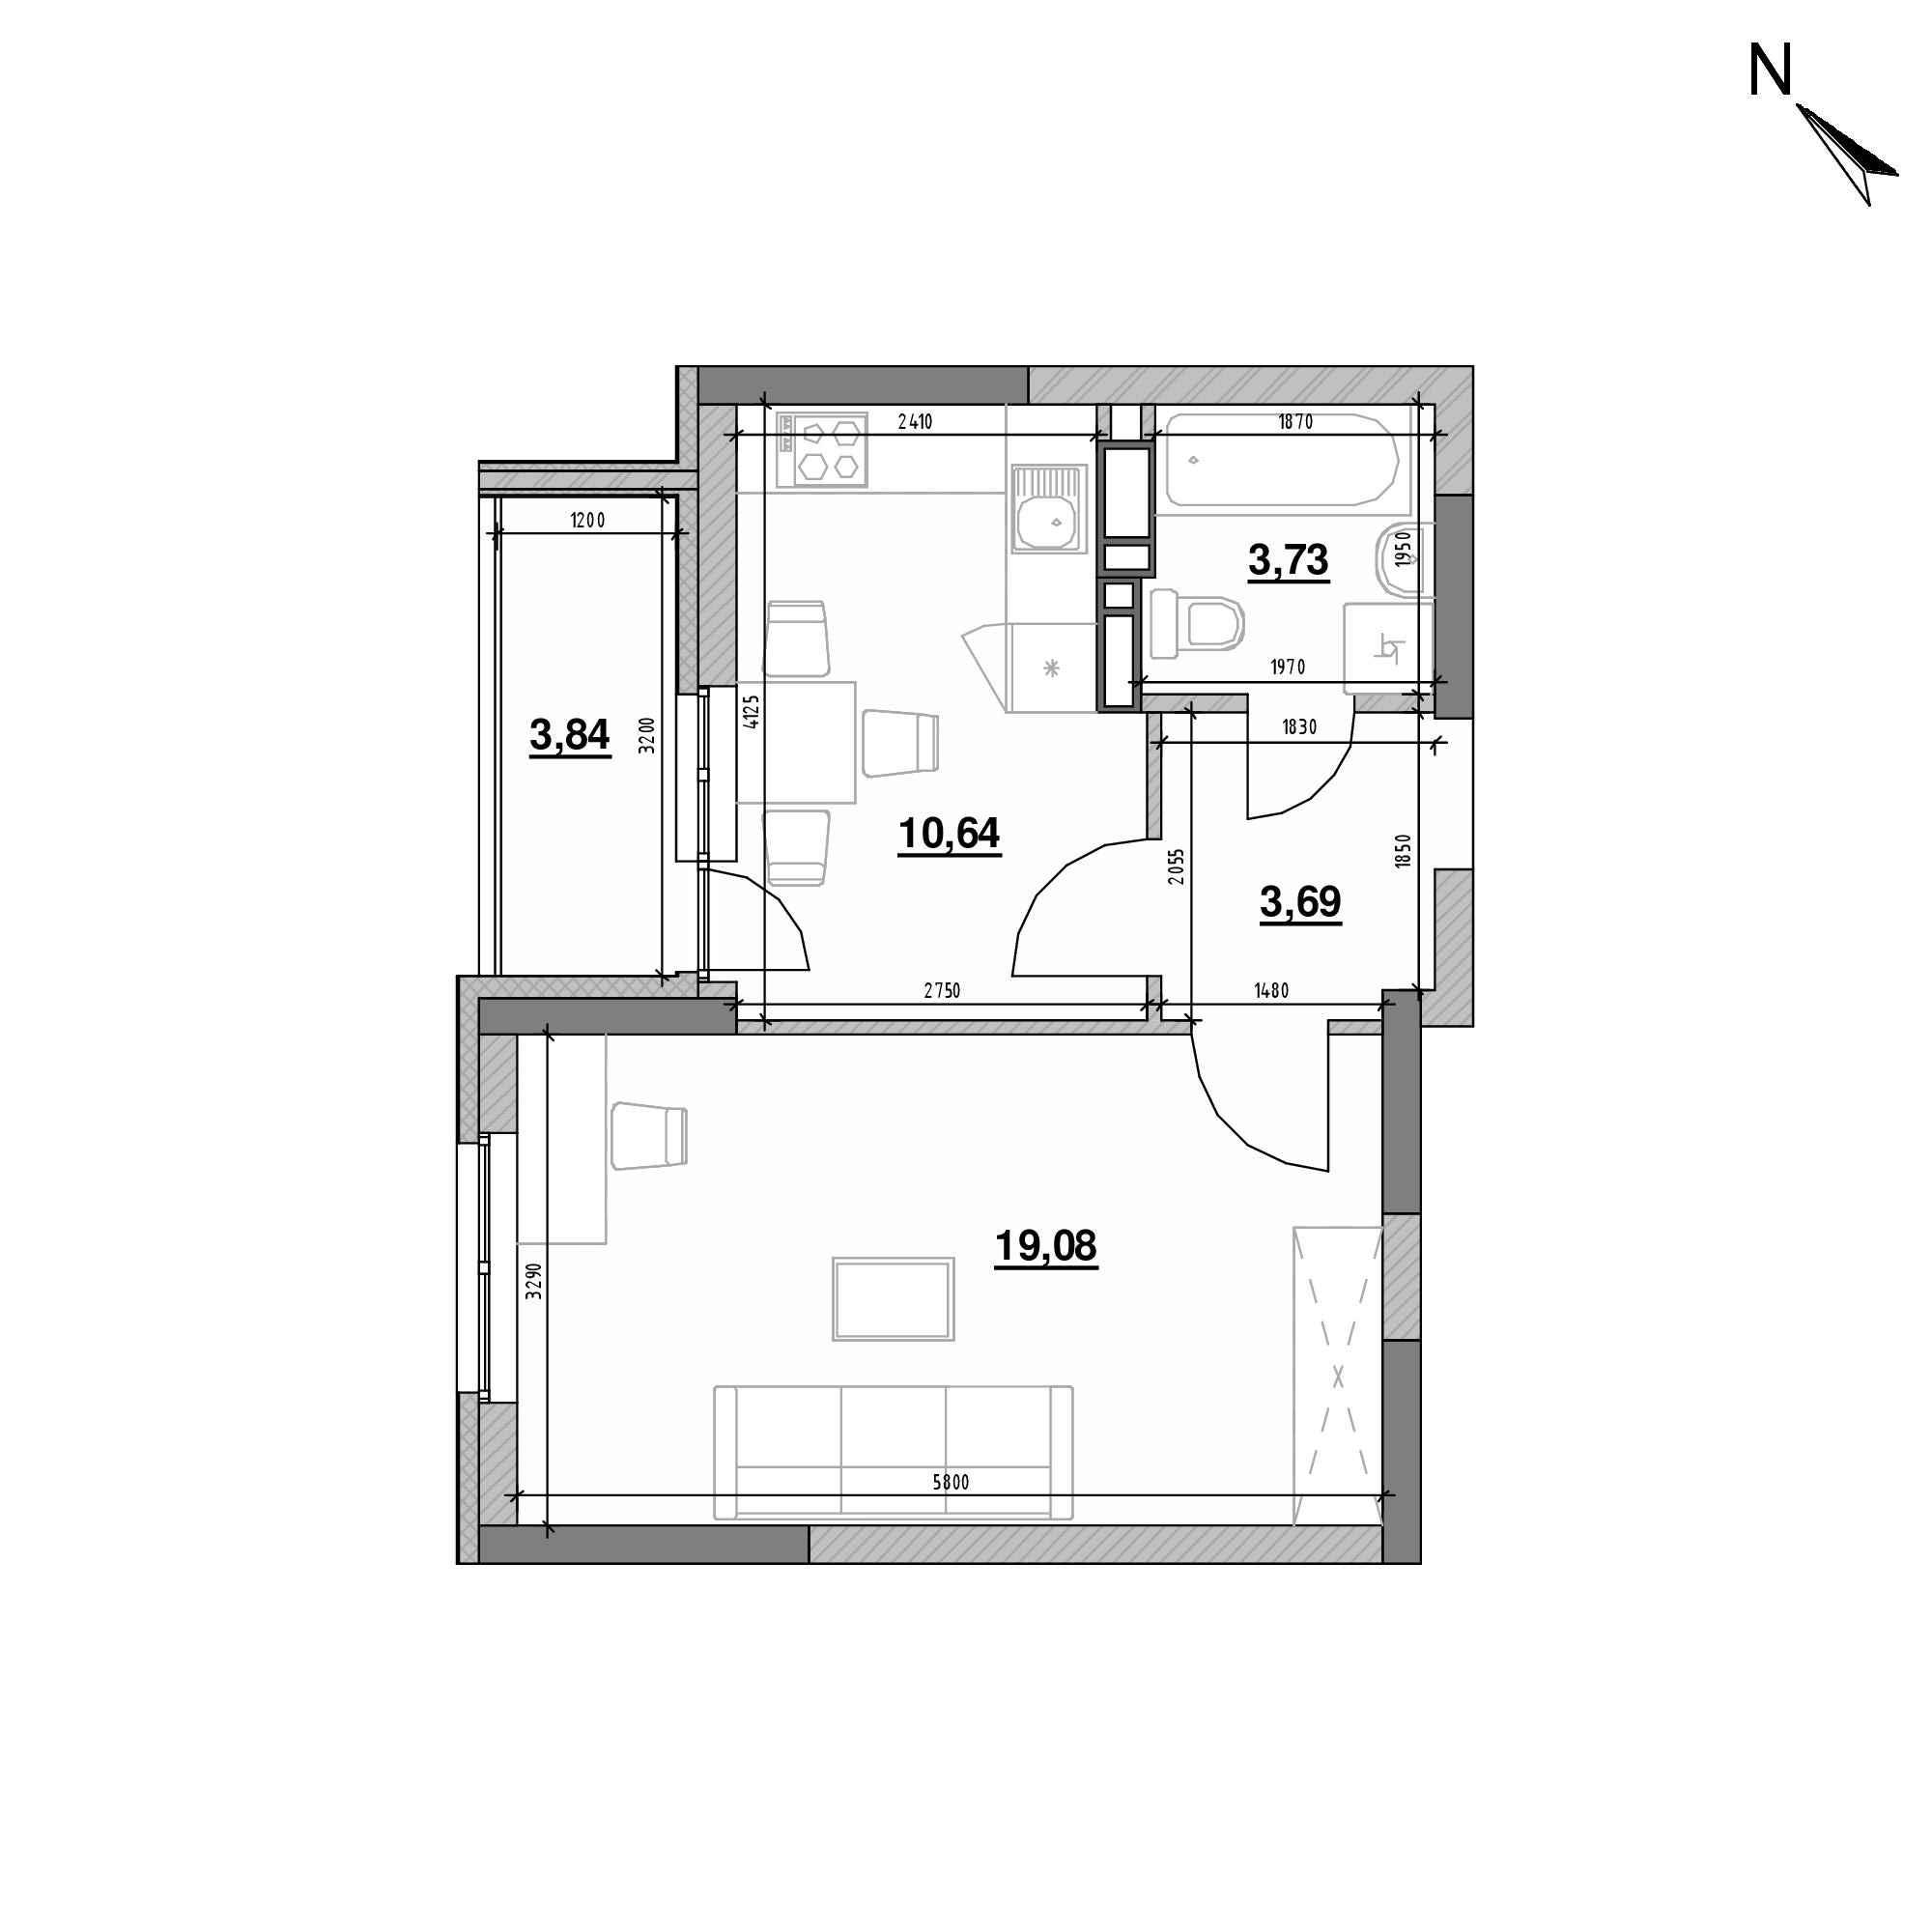 ЖК Оk'Land: планування 1-кімнатної квартири, №269, 40.98 м<sup>2</sup>